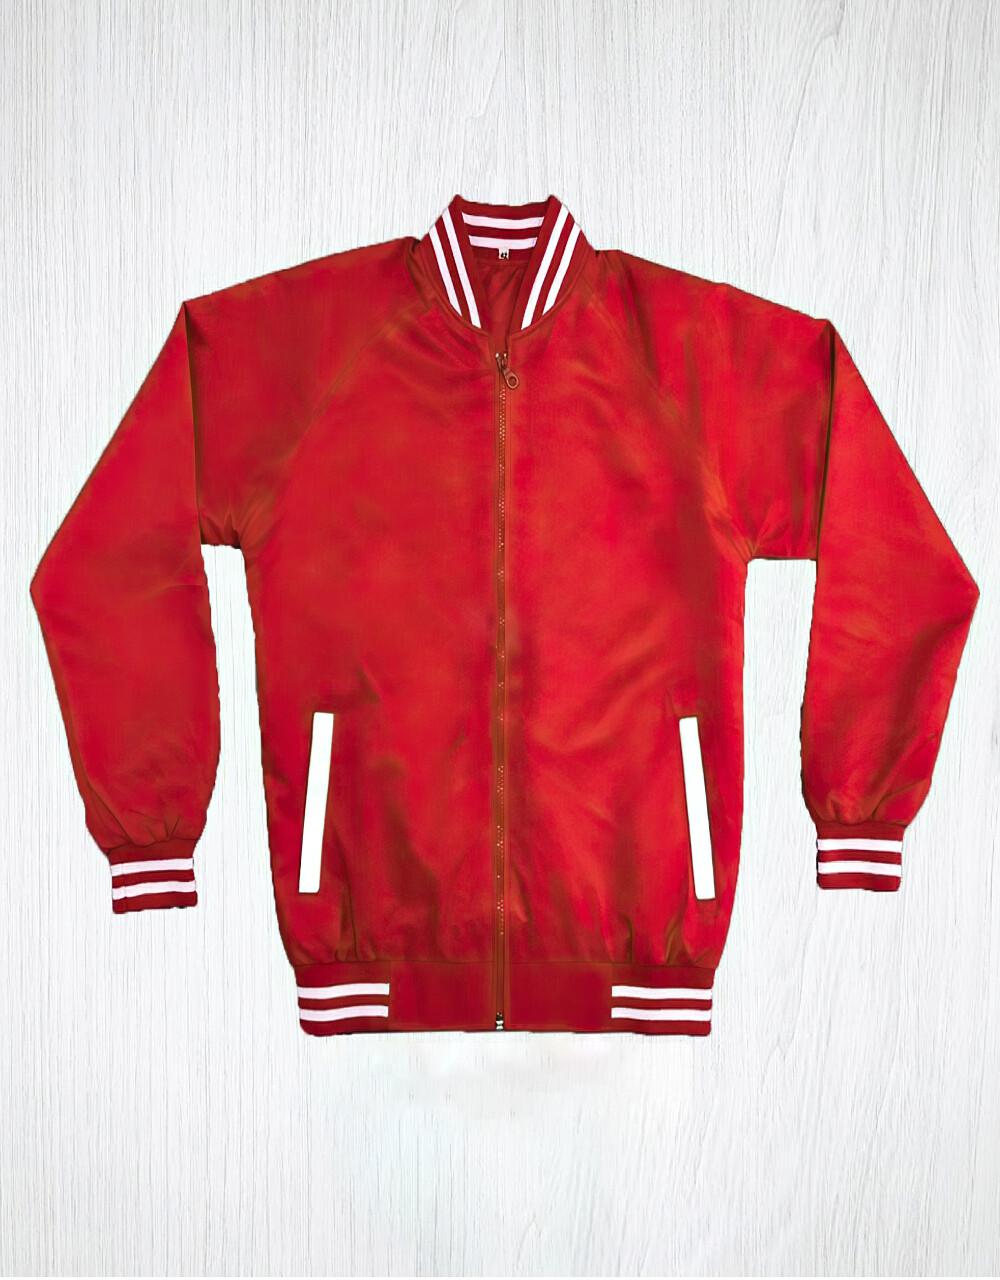 Red & White Stripe Monkey Jacket